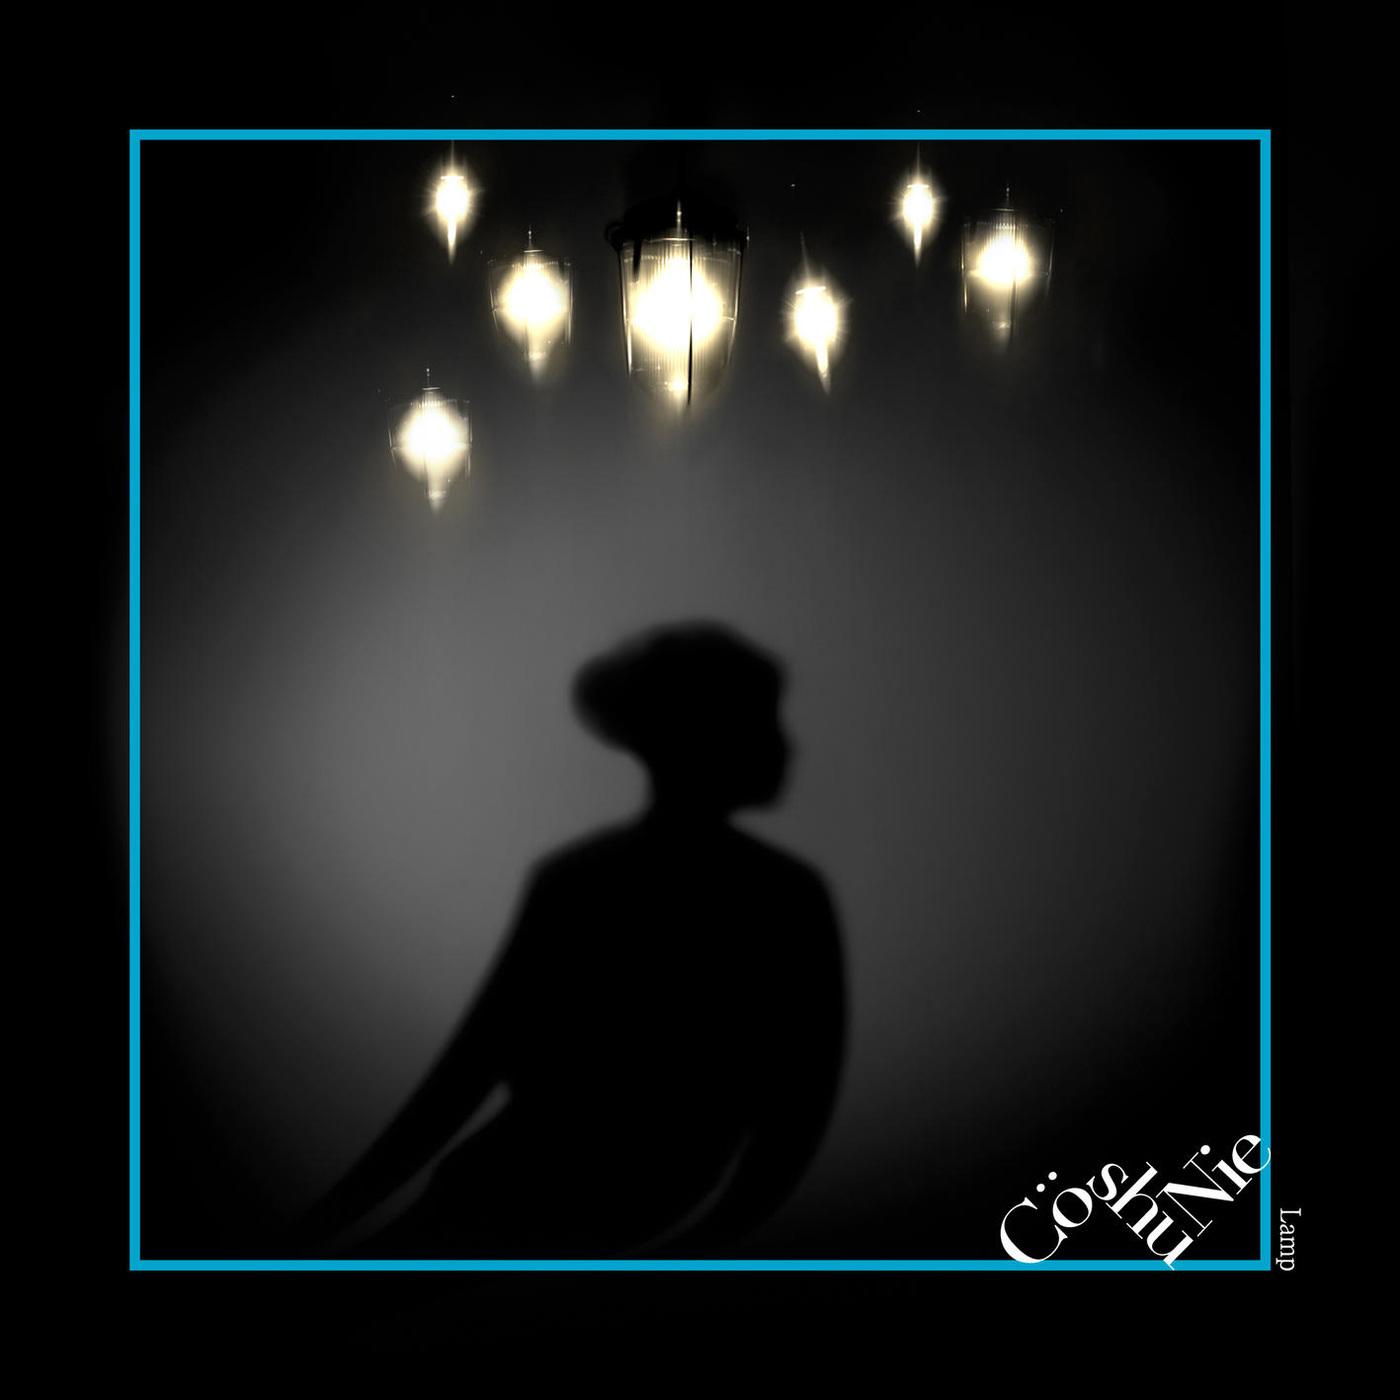 Cö shu Nie - Lamp   Yakusoku no Naverland Ending   Lyrics & Indonesia Translations album art